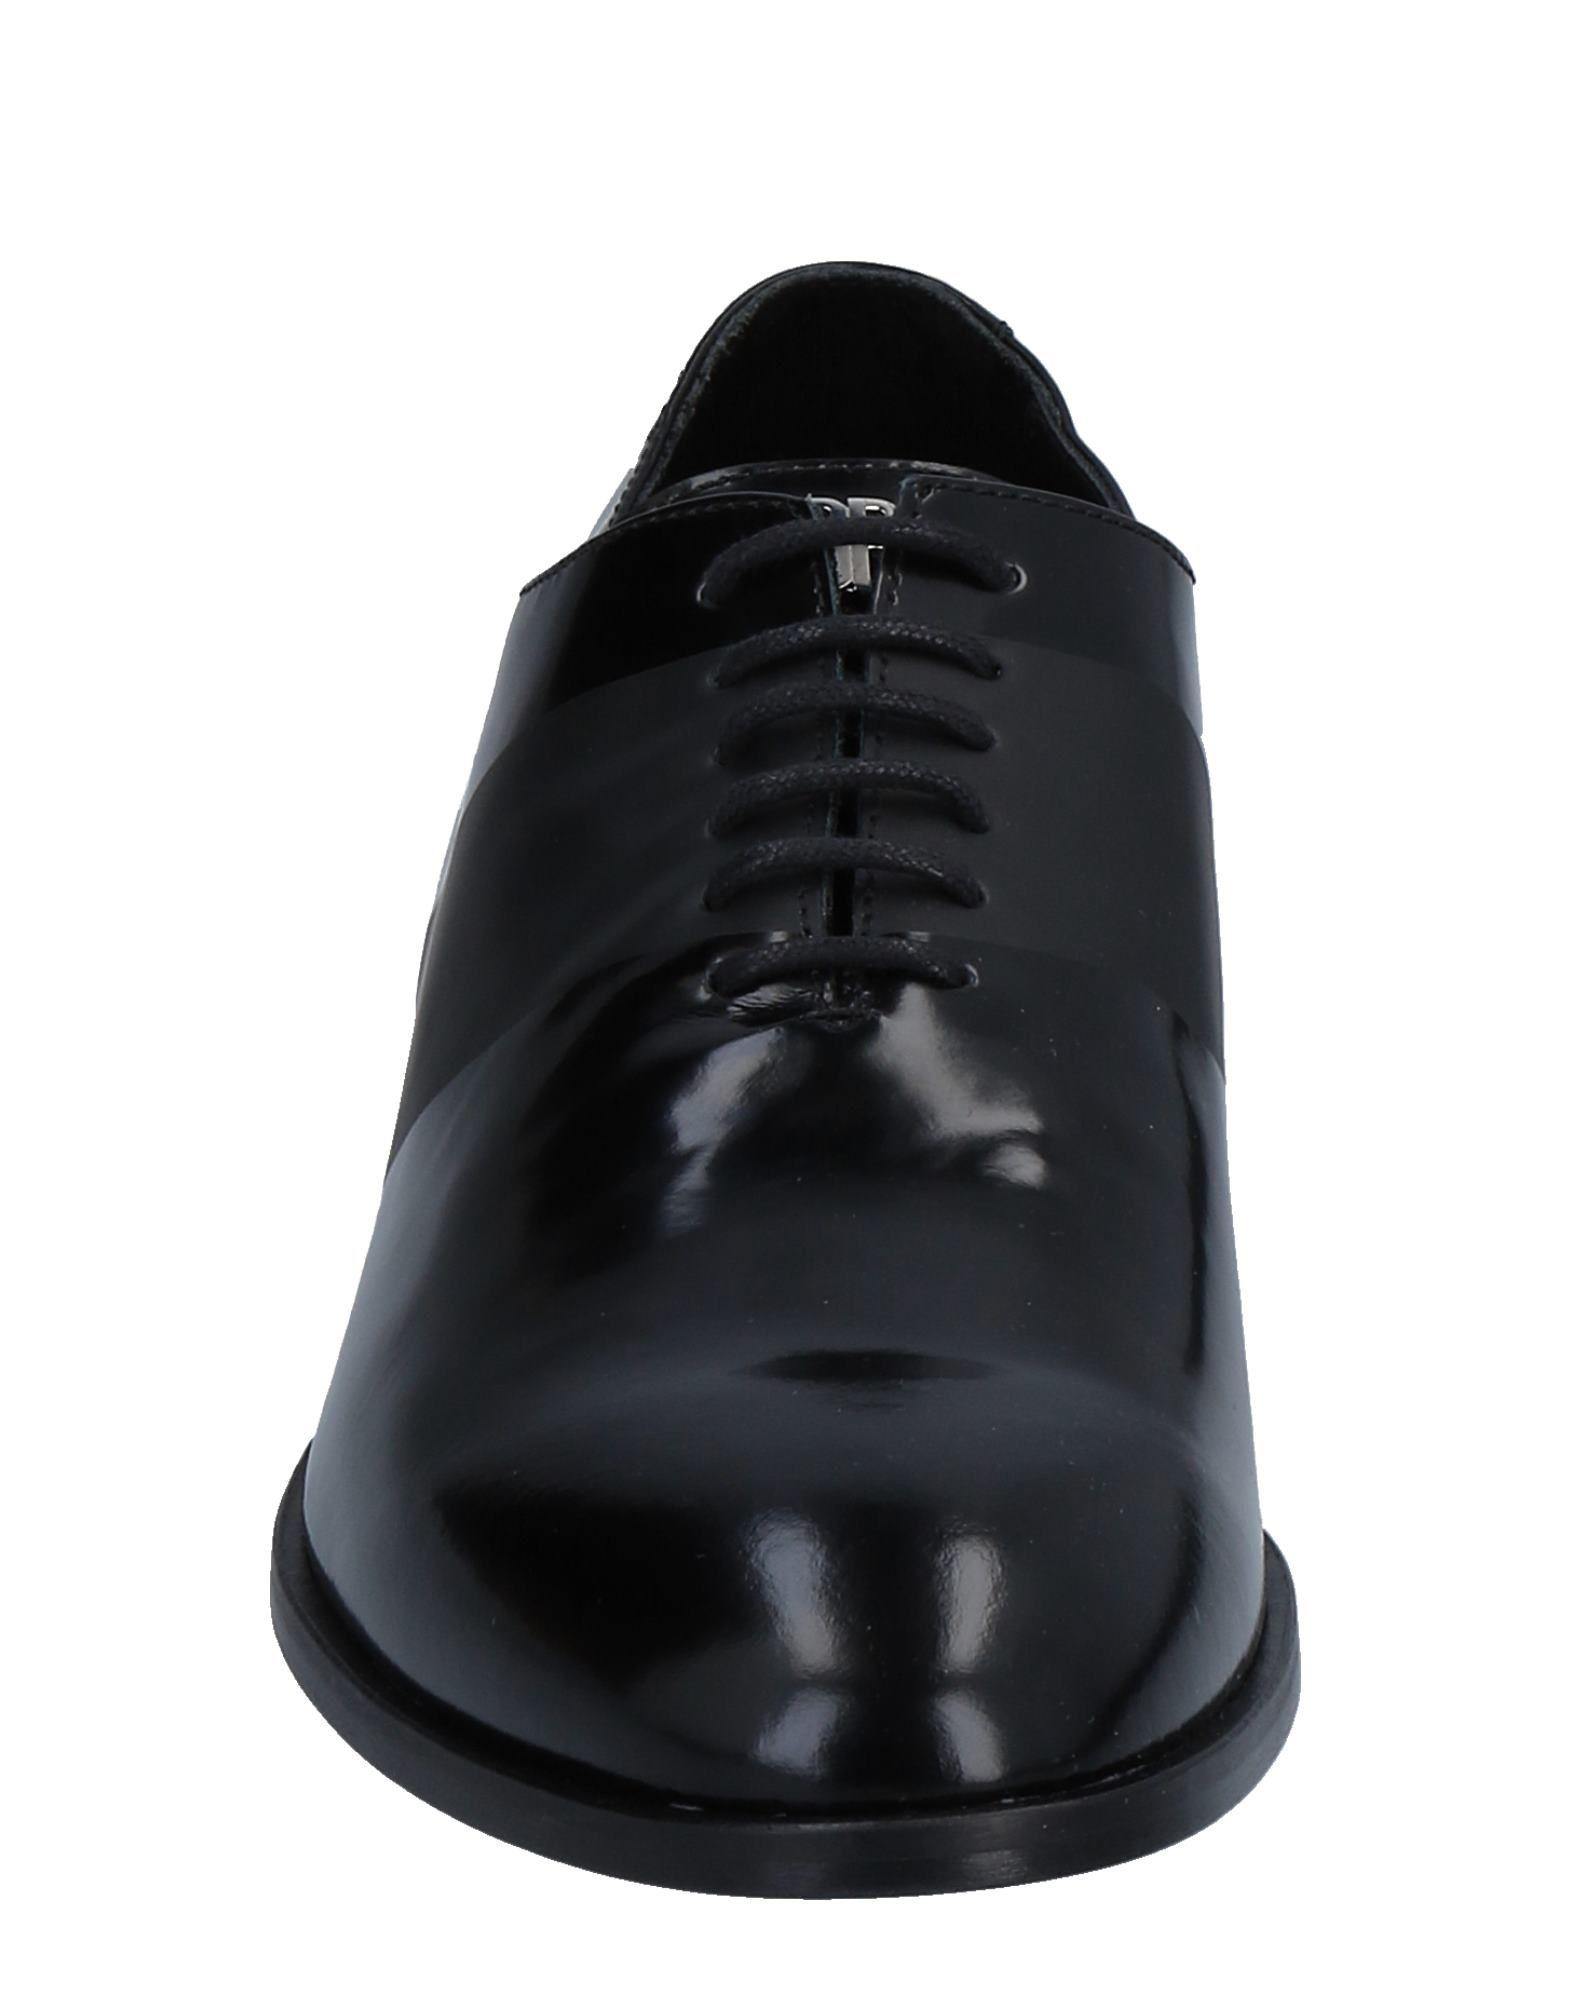 Dirk Bikkembergs Schnürschuhe Herren   Herren 11513263VF Neue Schuhe 47d415